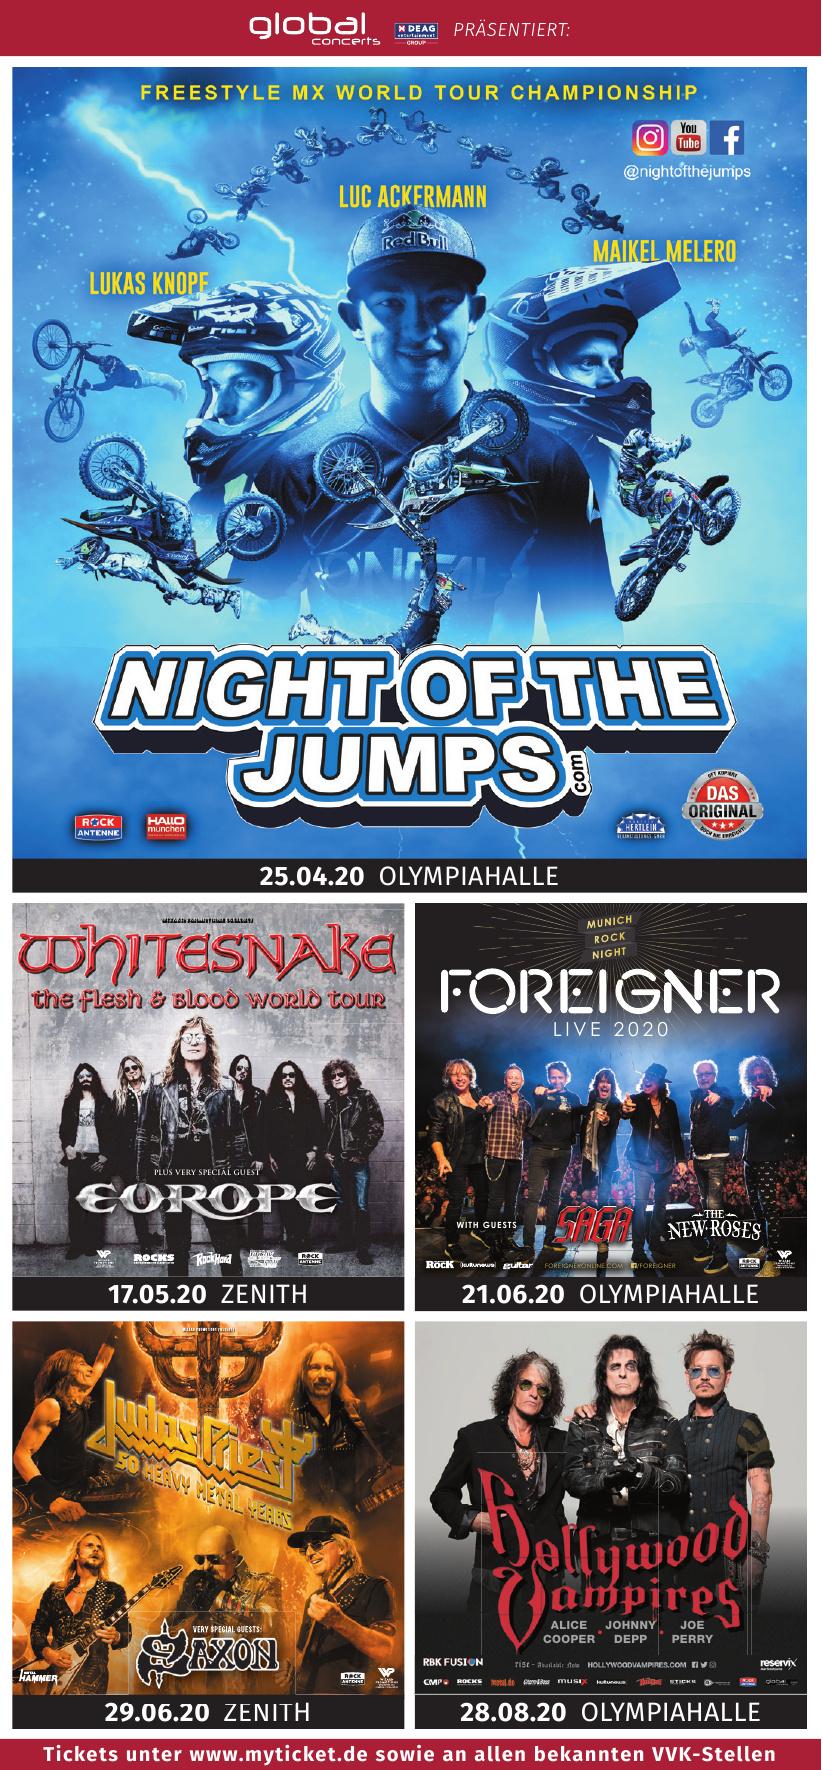 Global Concerts